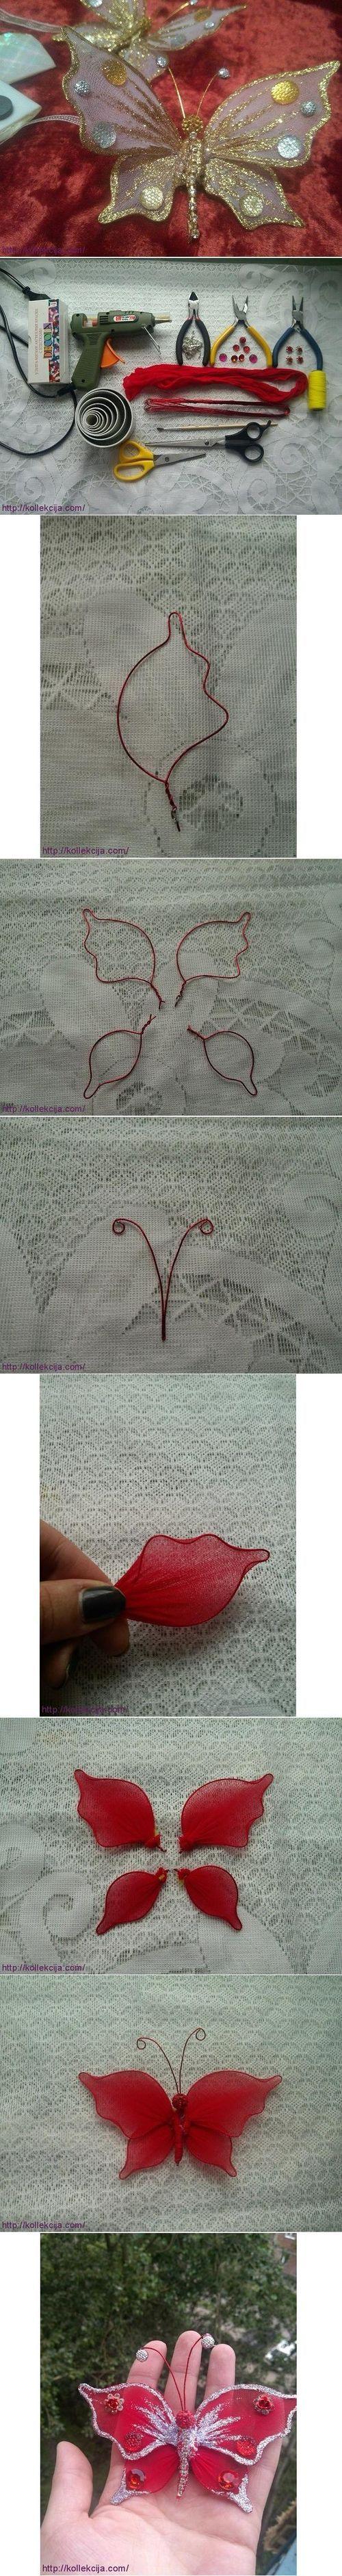 DIY Nylon Butterfly DIY Projects / UsefulDIY.com on imgfave